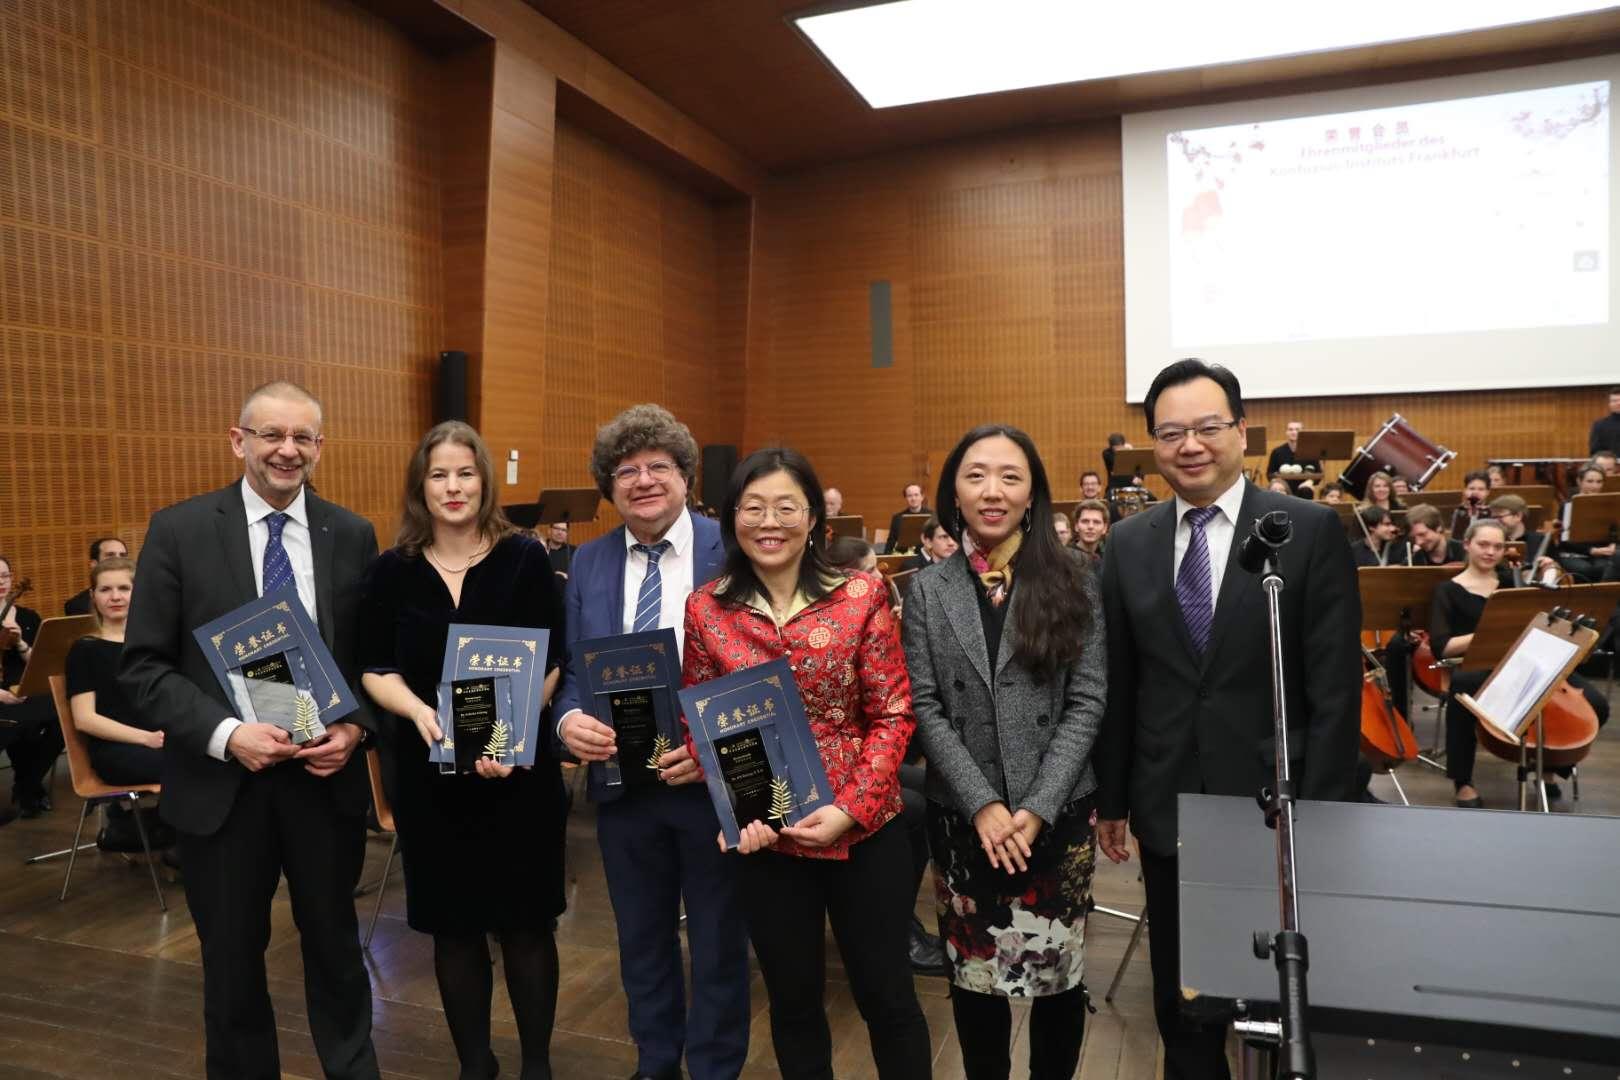 20190130_Neujahrskonzert-Konfuzius-Institut-Frankfurt (6)